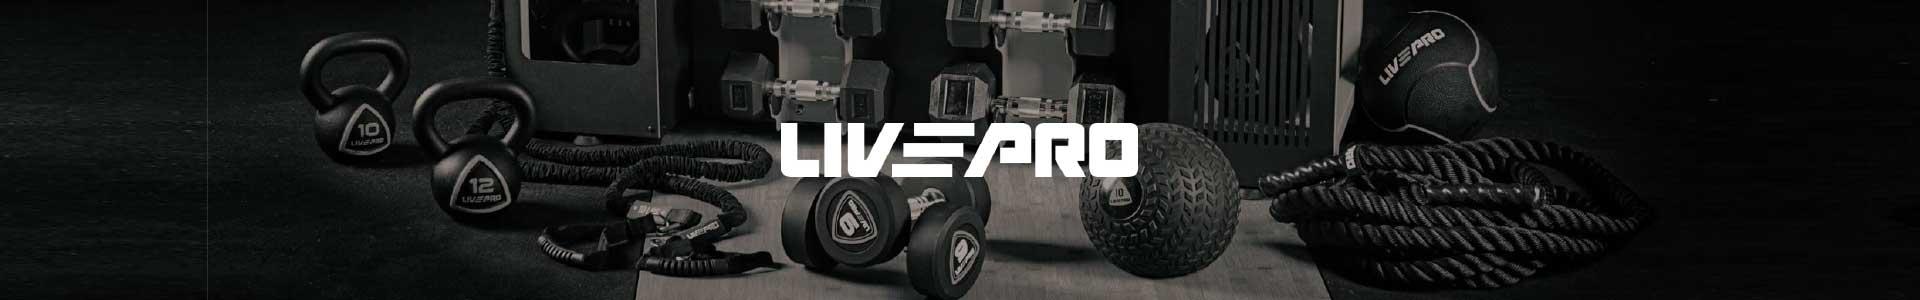 Budopunkt – Livepro Fitness Eesti